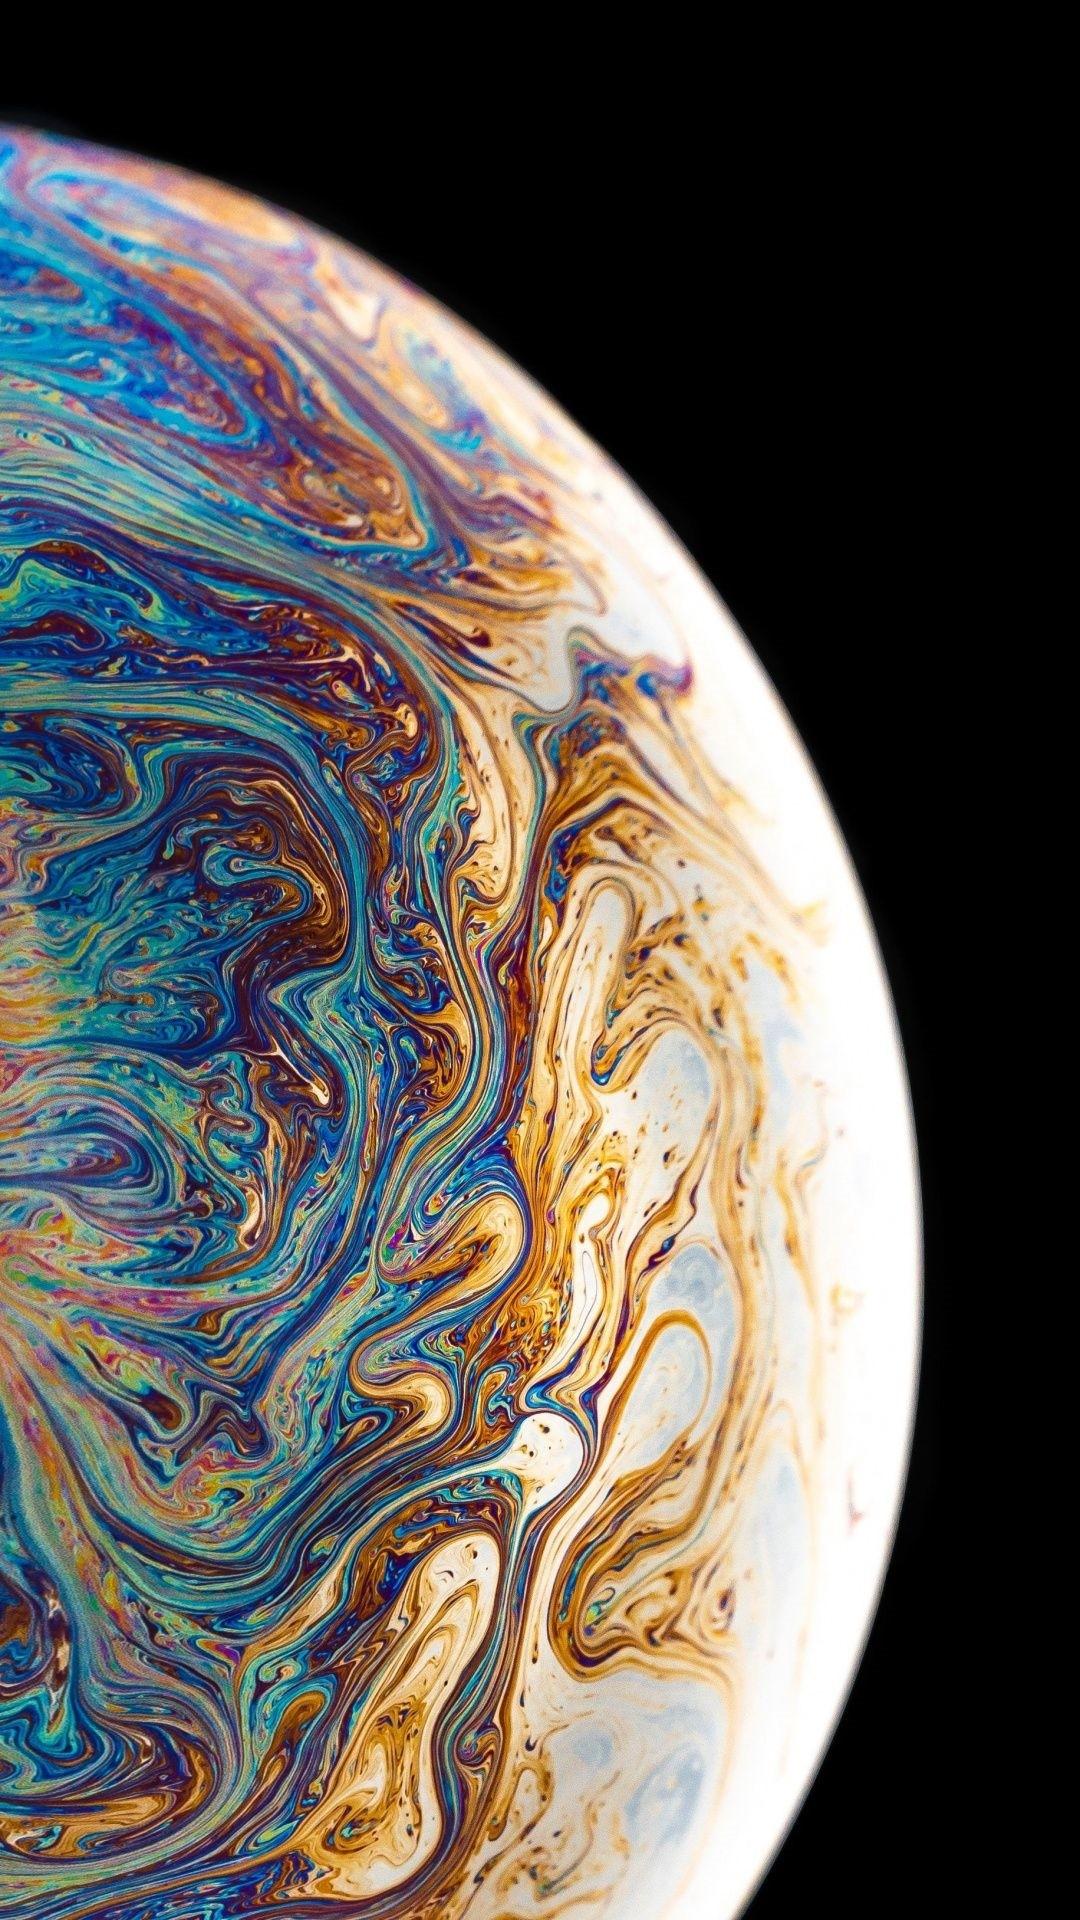 Planet iPhone 5 wallpaper